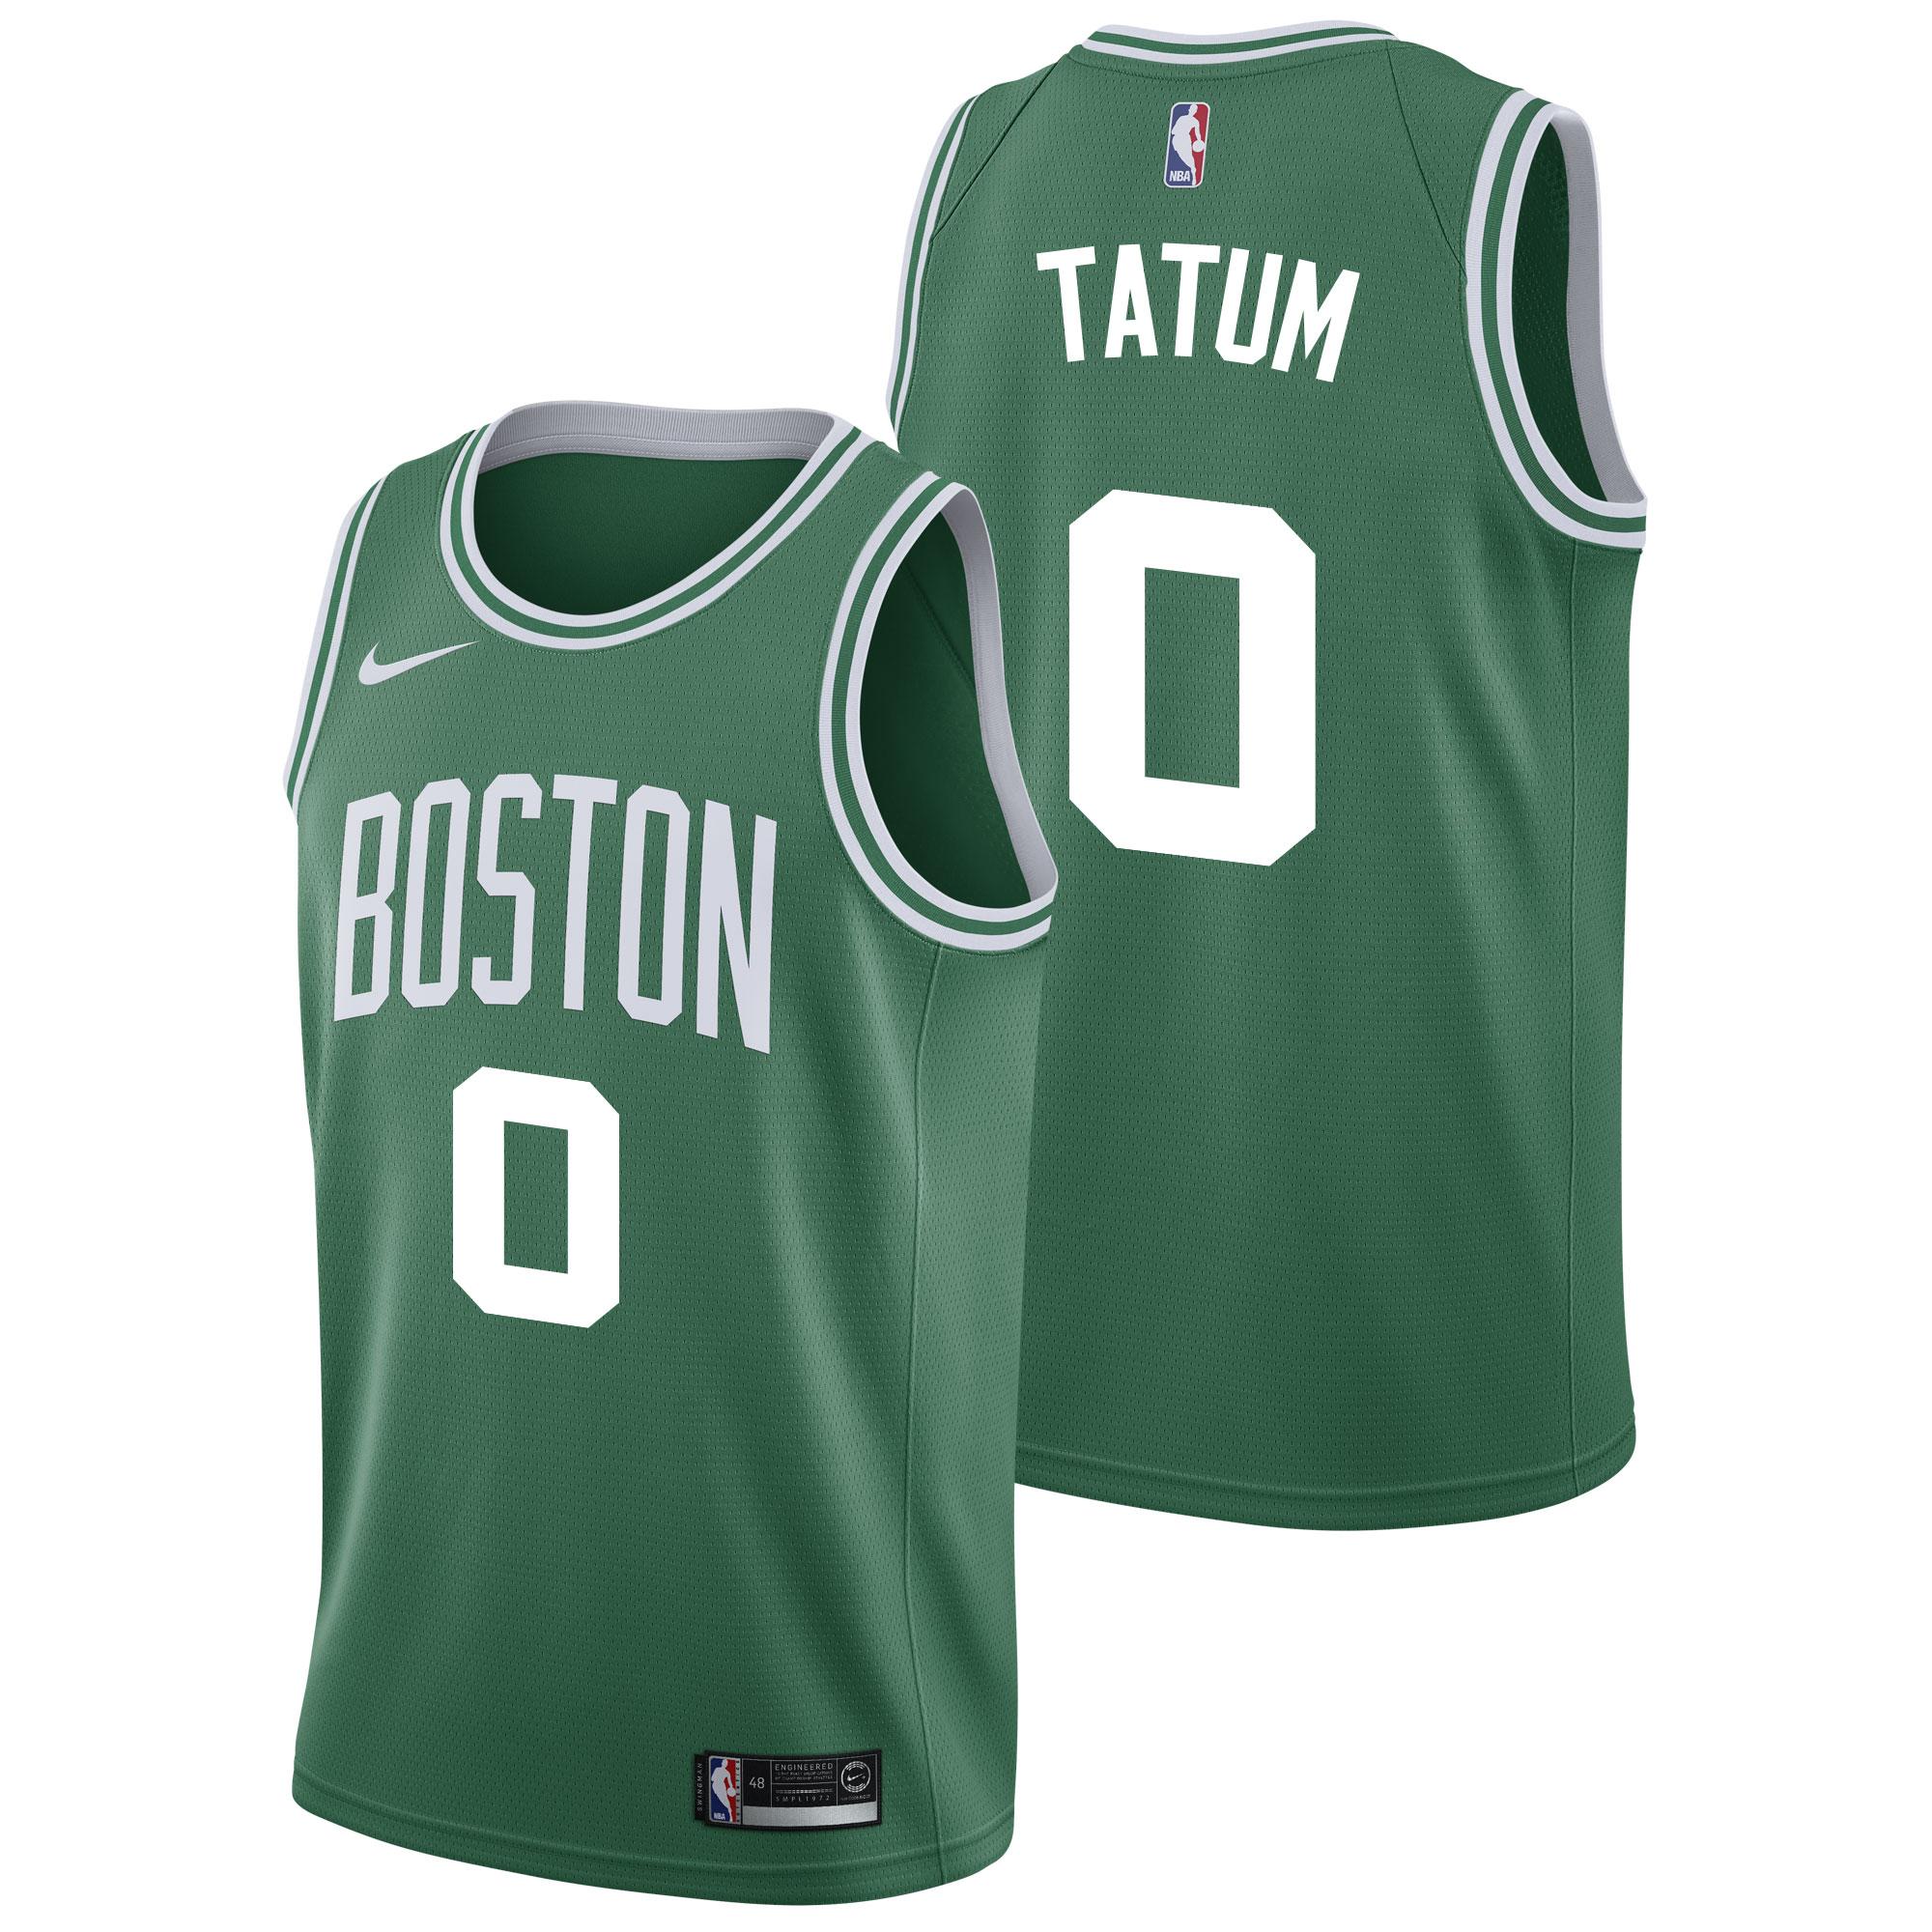 """Boston Celtics Nike Icon Swingman Jersey - Jayson Tatum - Mens"""